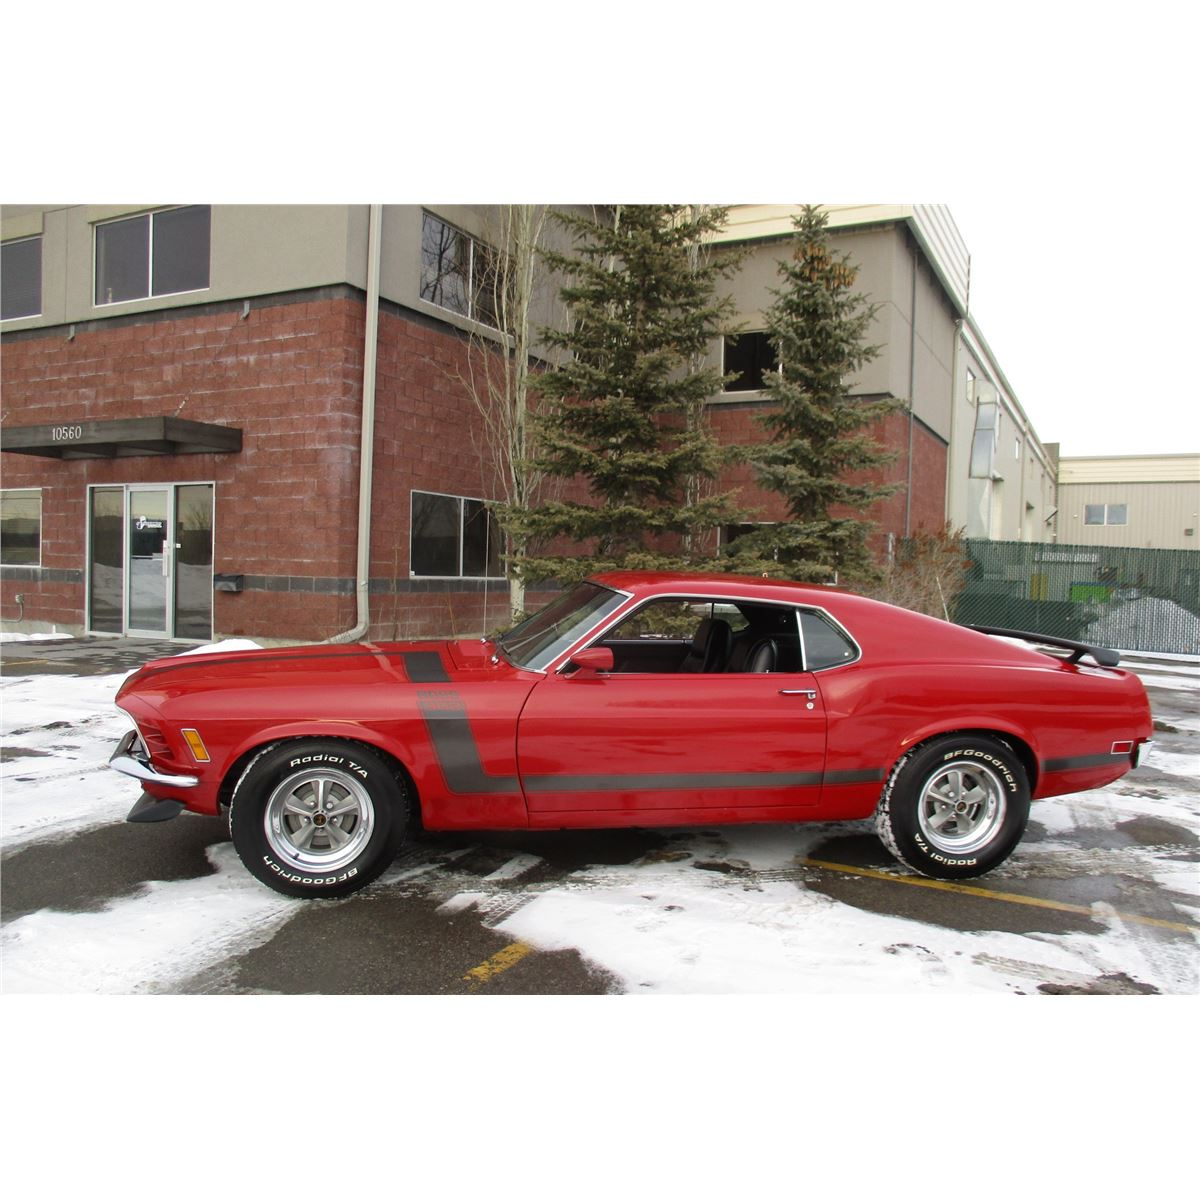 1970 Mustang Fastback 302